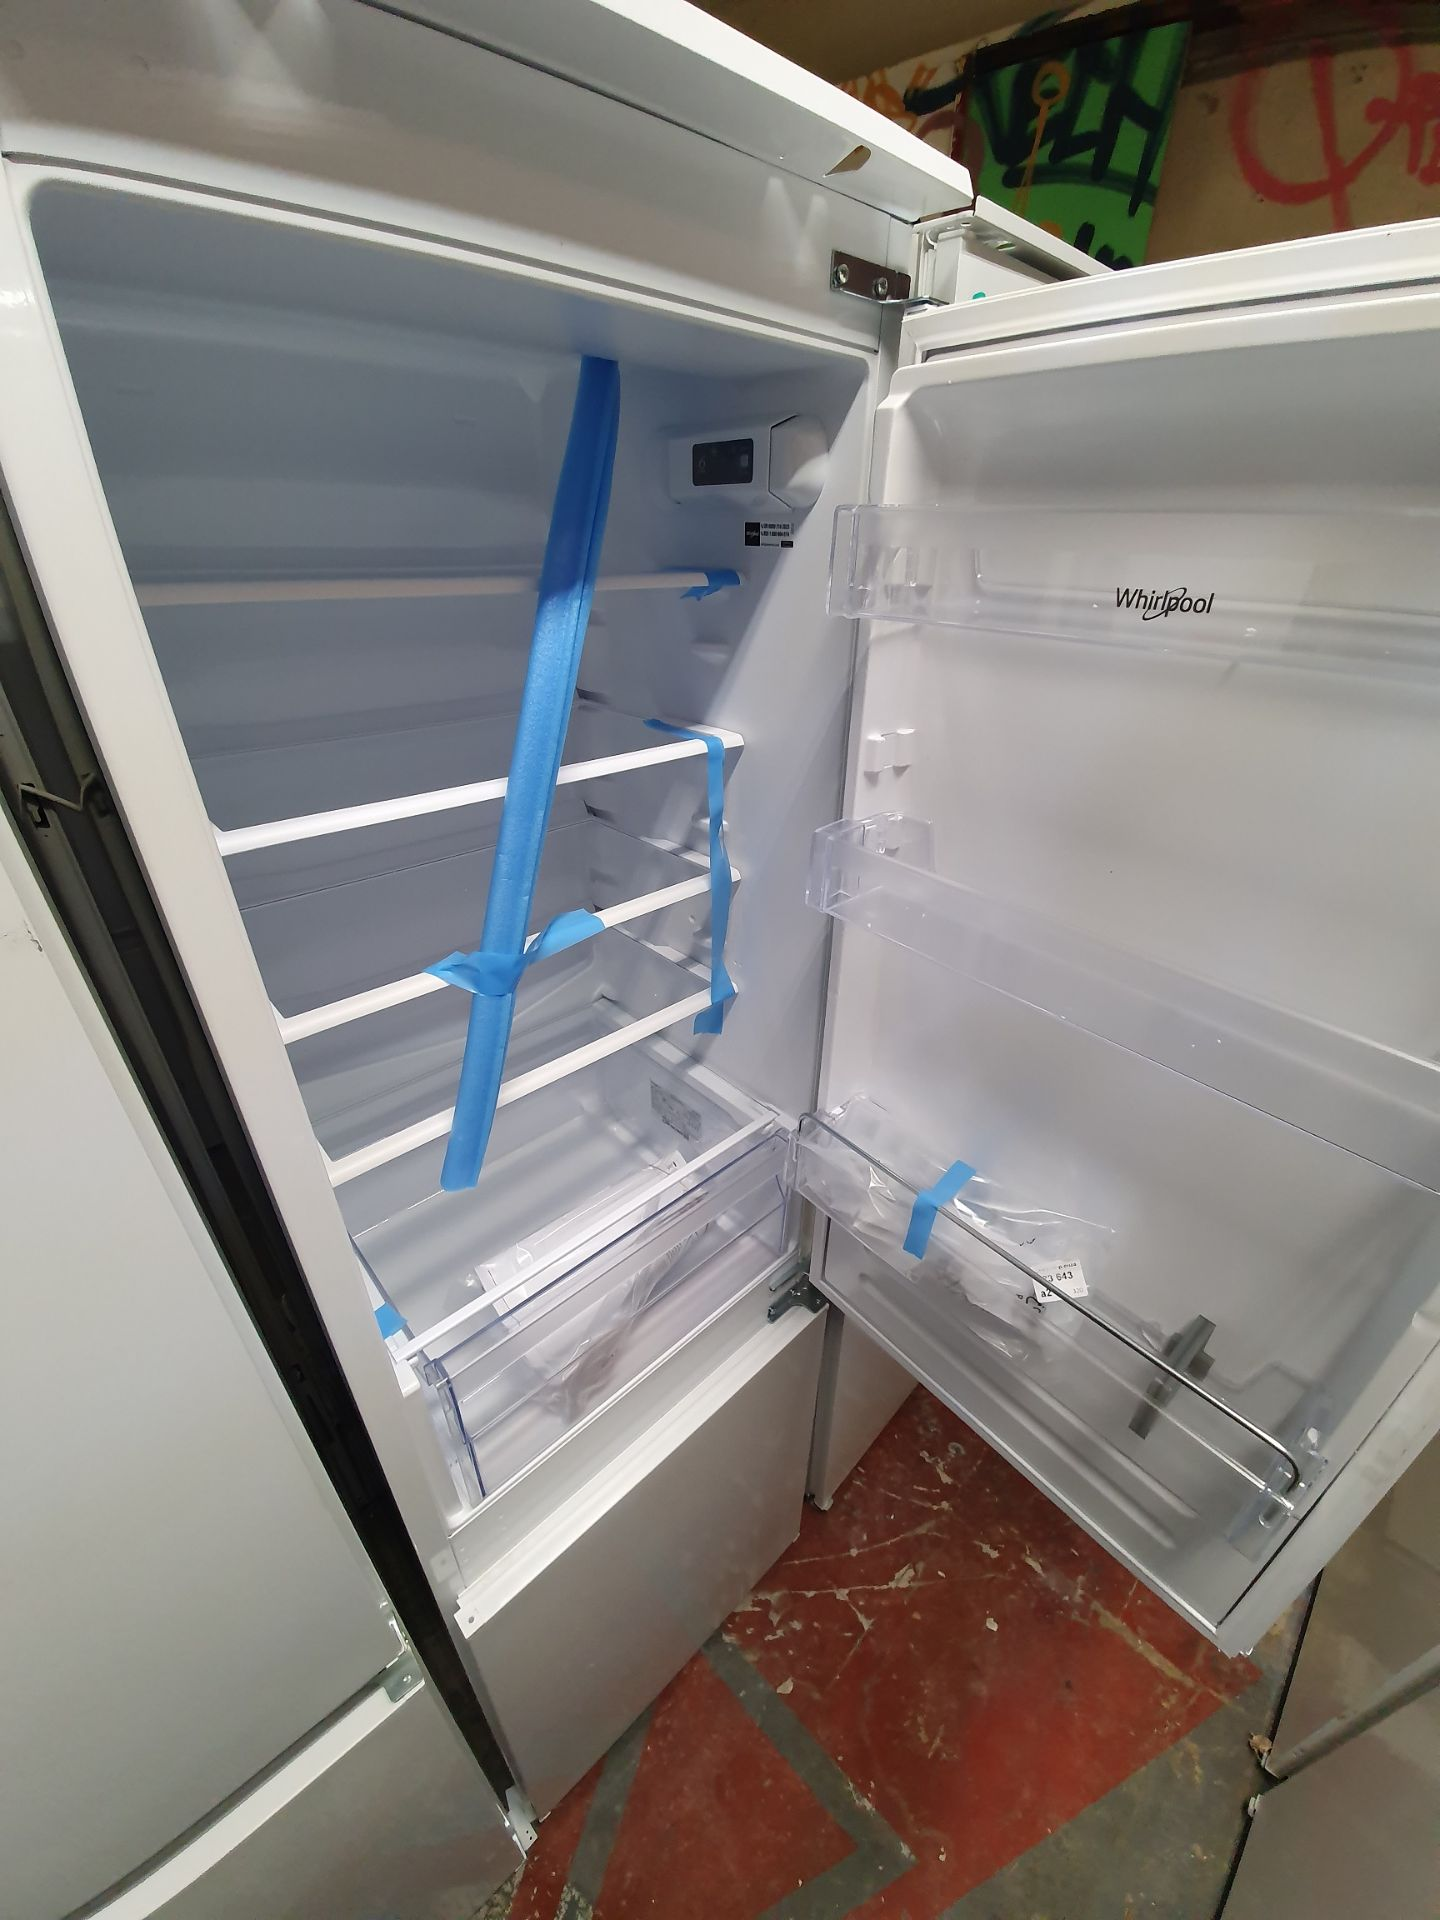 NEW/GRADED AND UNPACKAGED Zanussi ZBB27450SV Integrated 50/50 Fridge Freezer (Brand new slight - Image 10 of 14